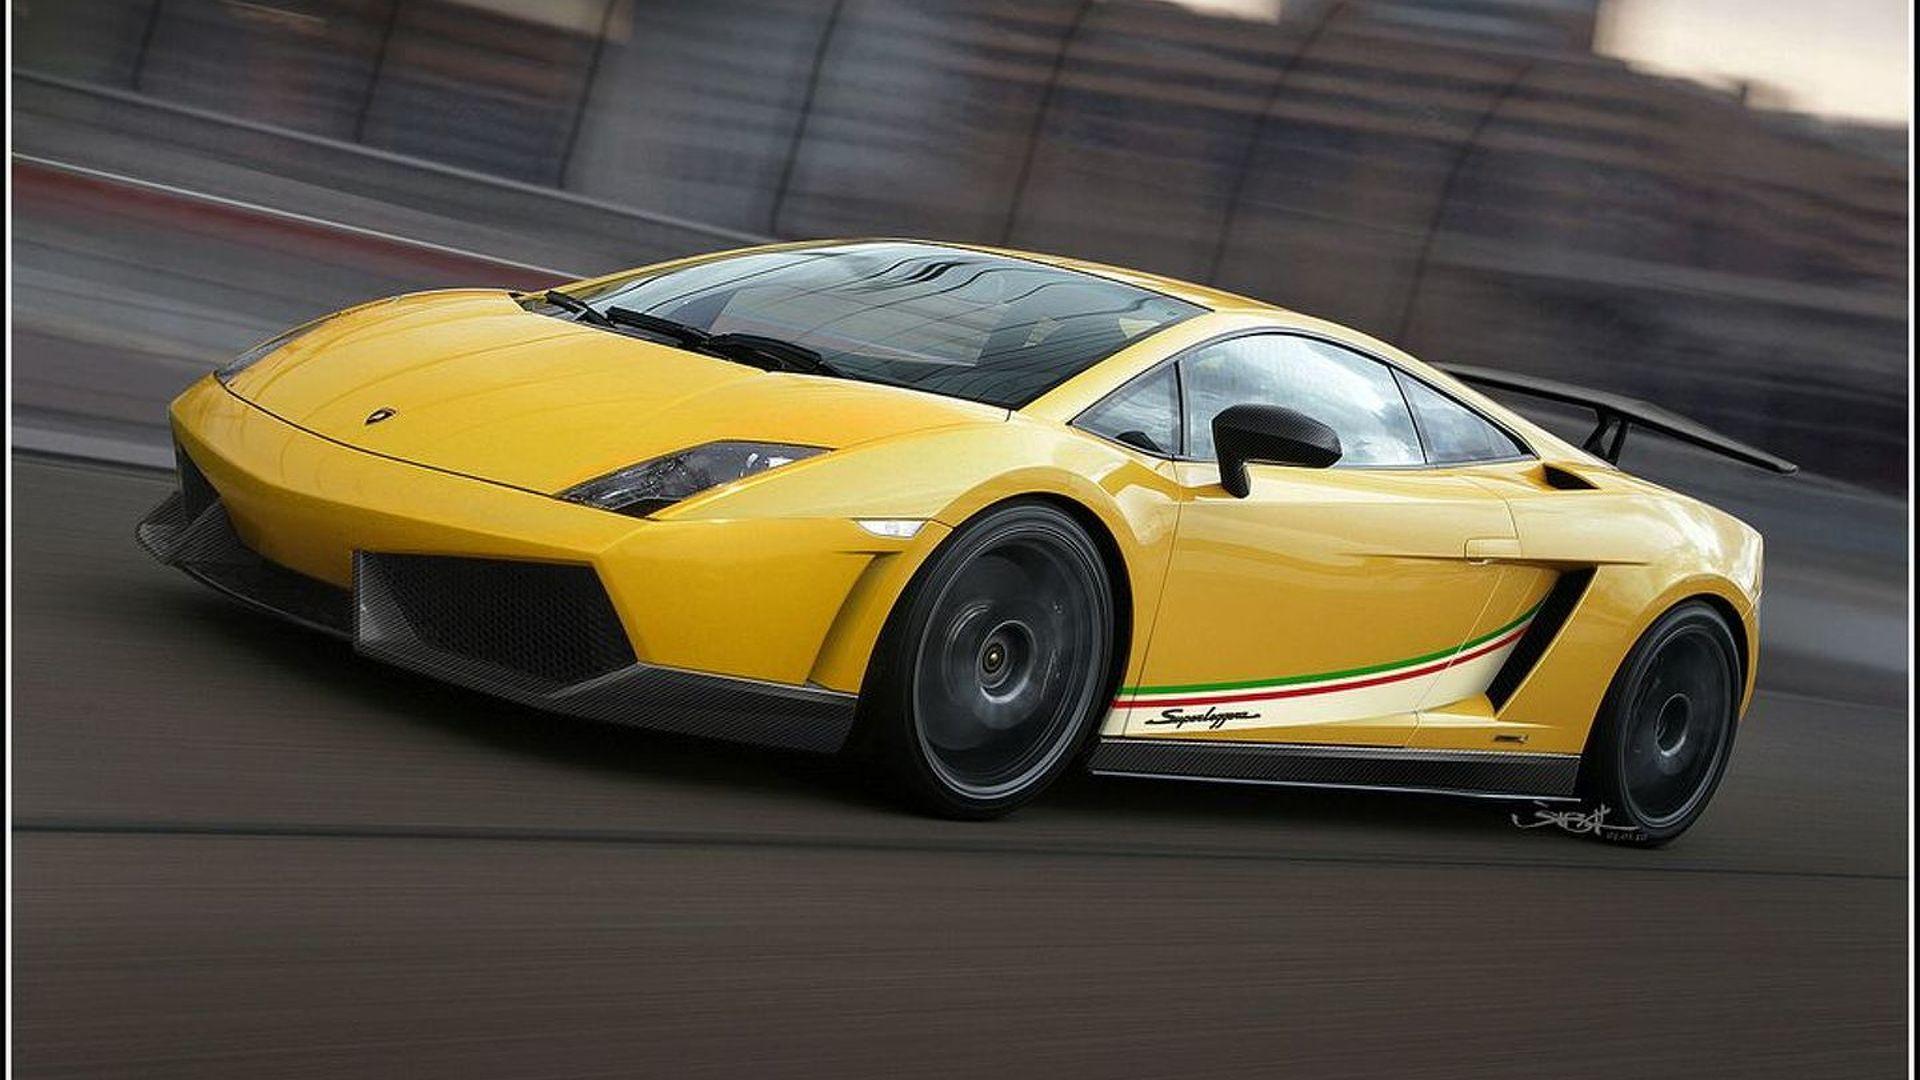 Ordinaire Lamborghini Gallardo LP570 4 Superleggera Further Details And Renderings  Surface